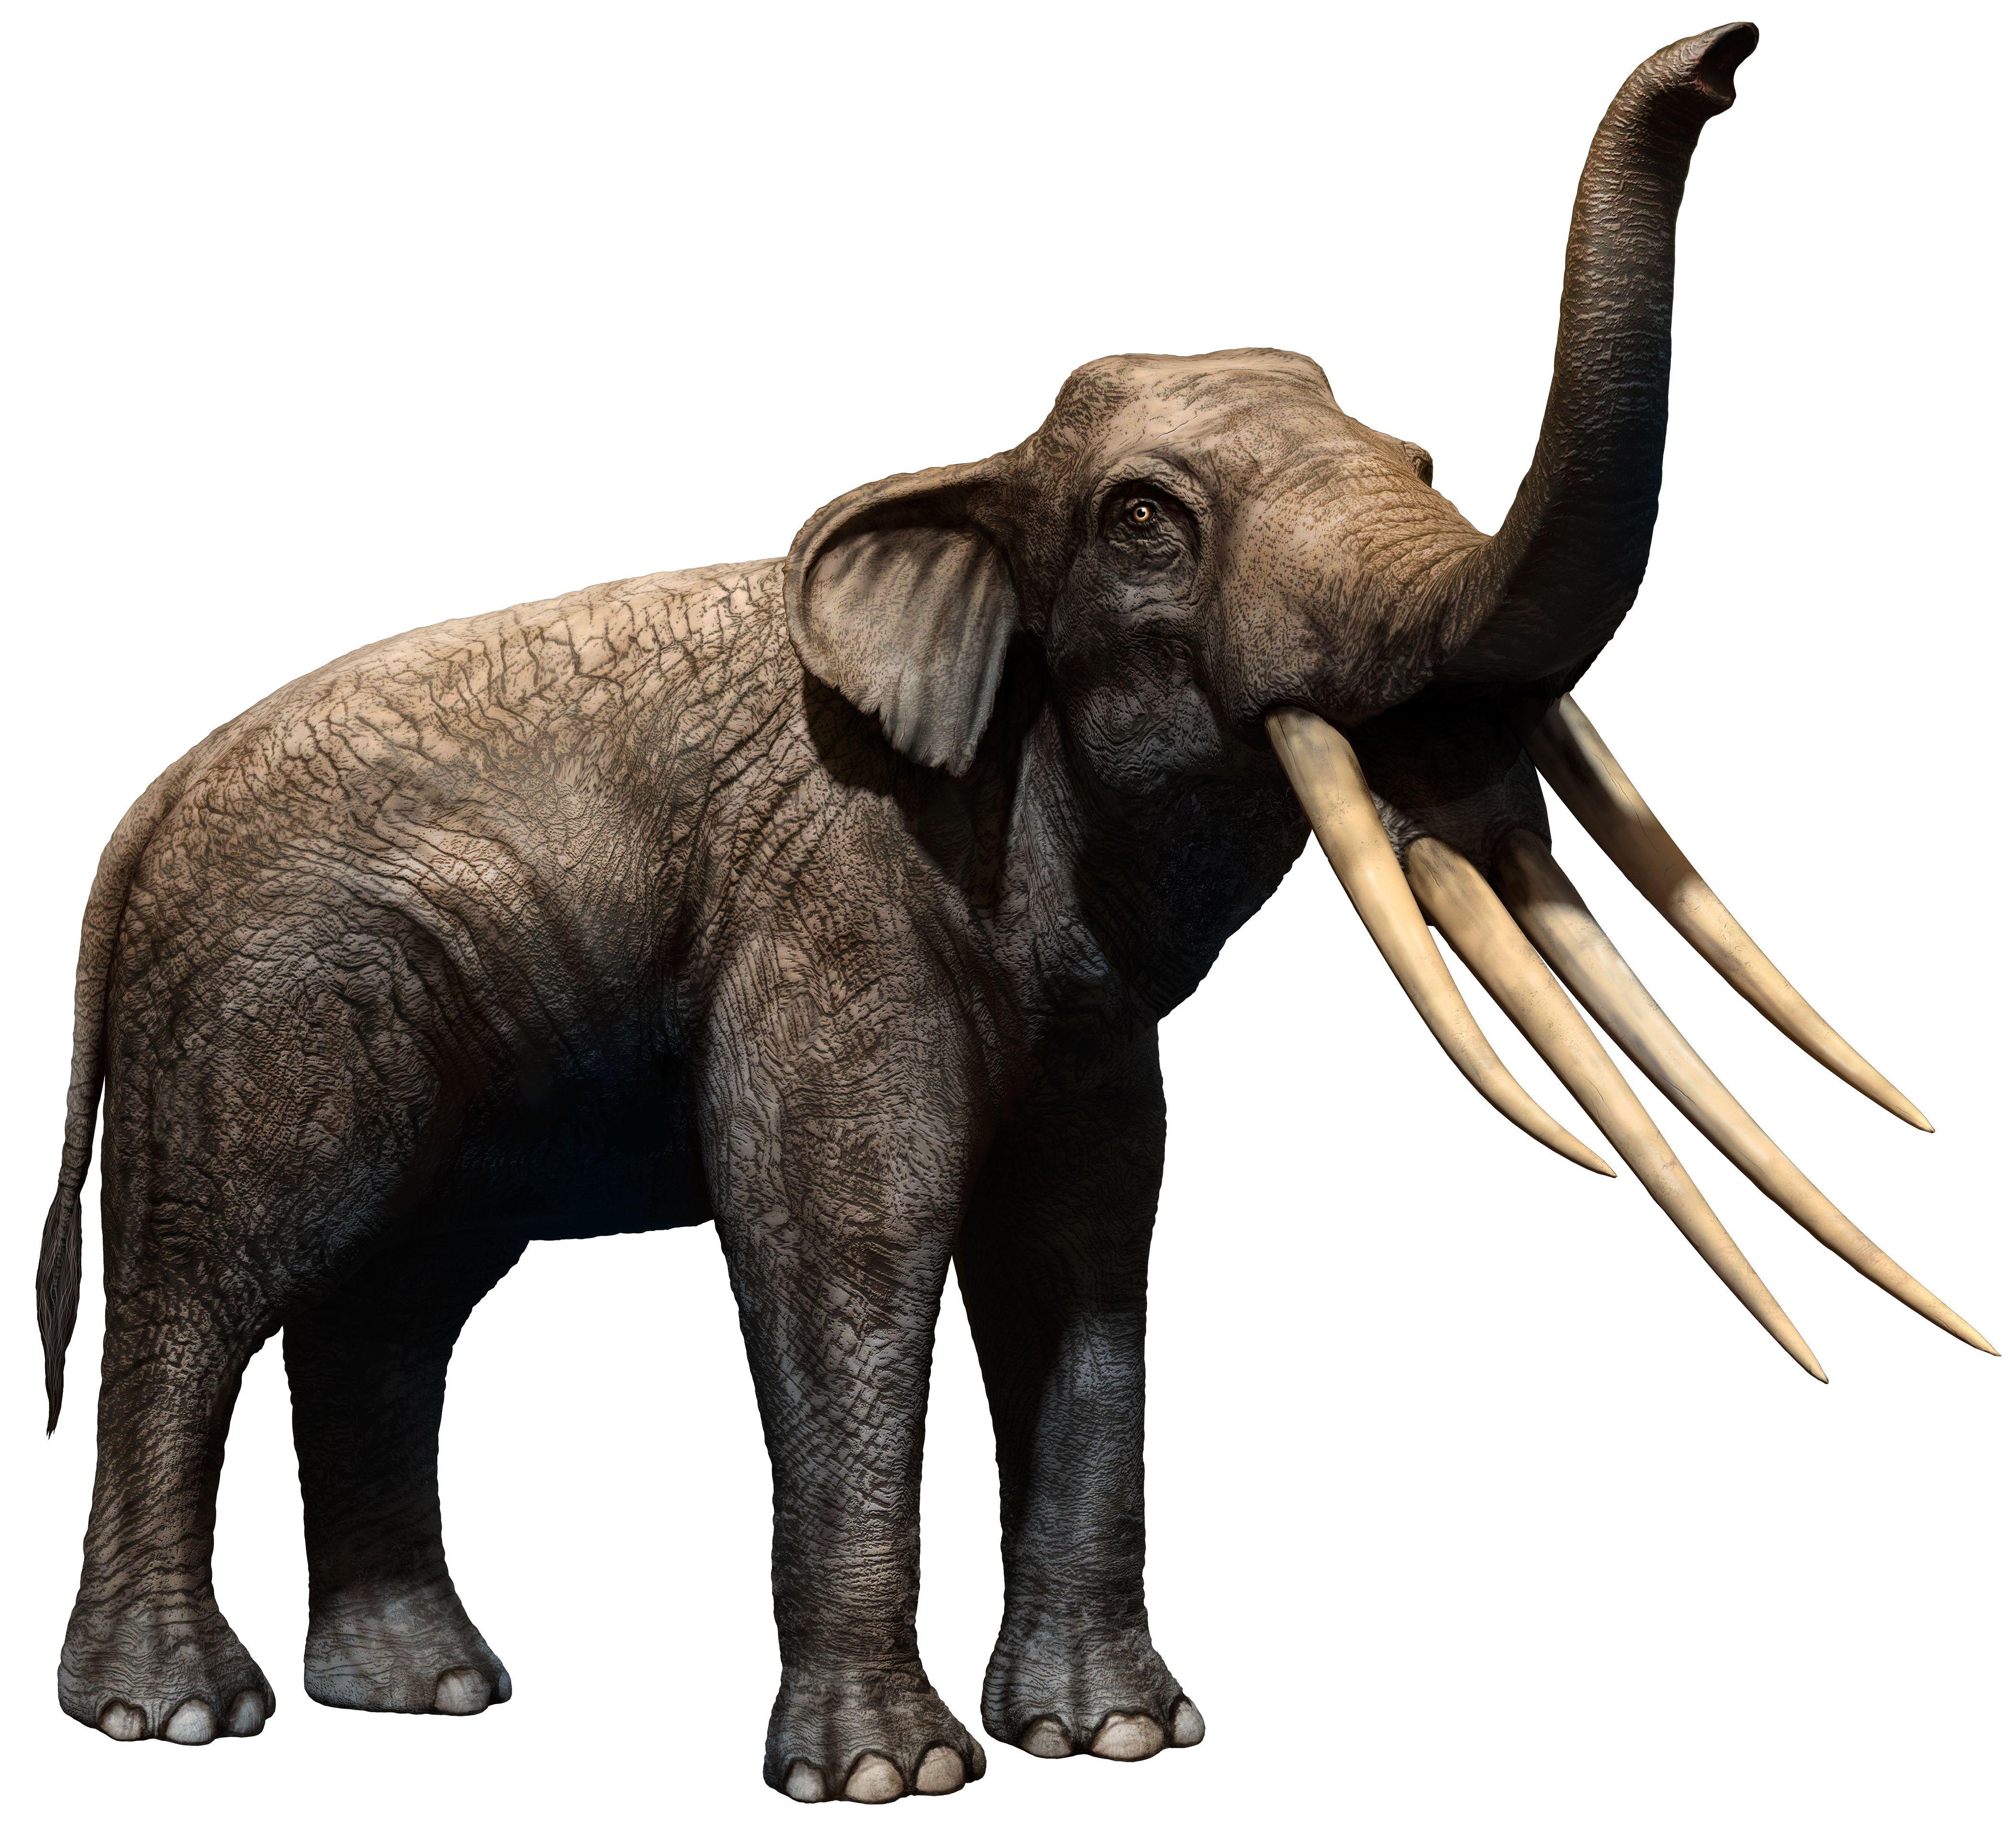 Stegotetrabelodon